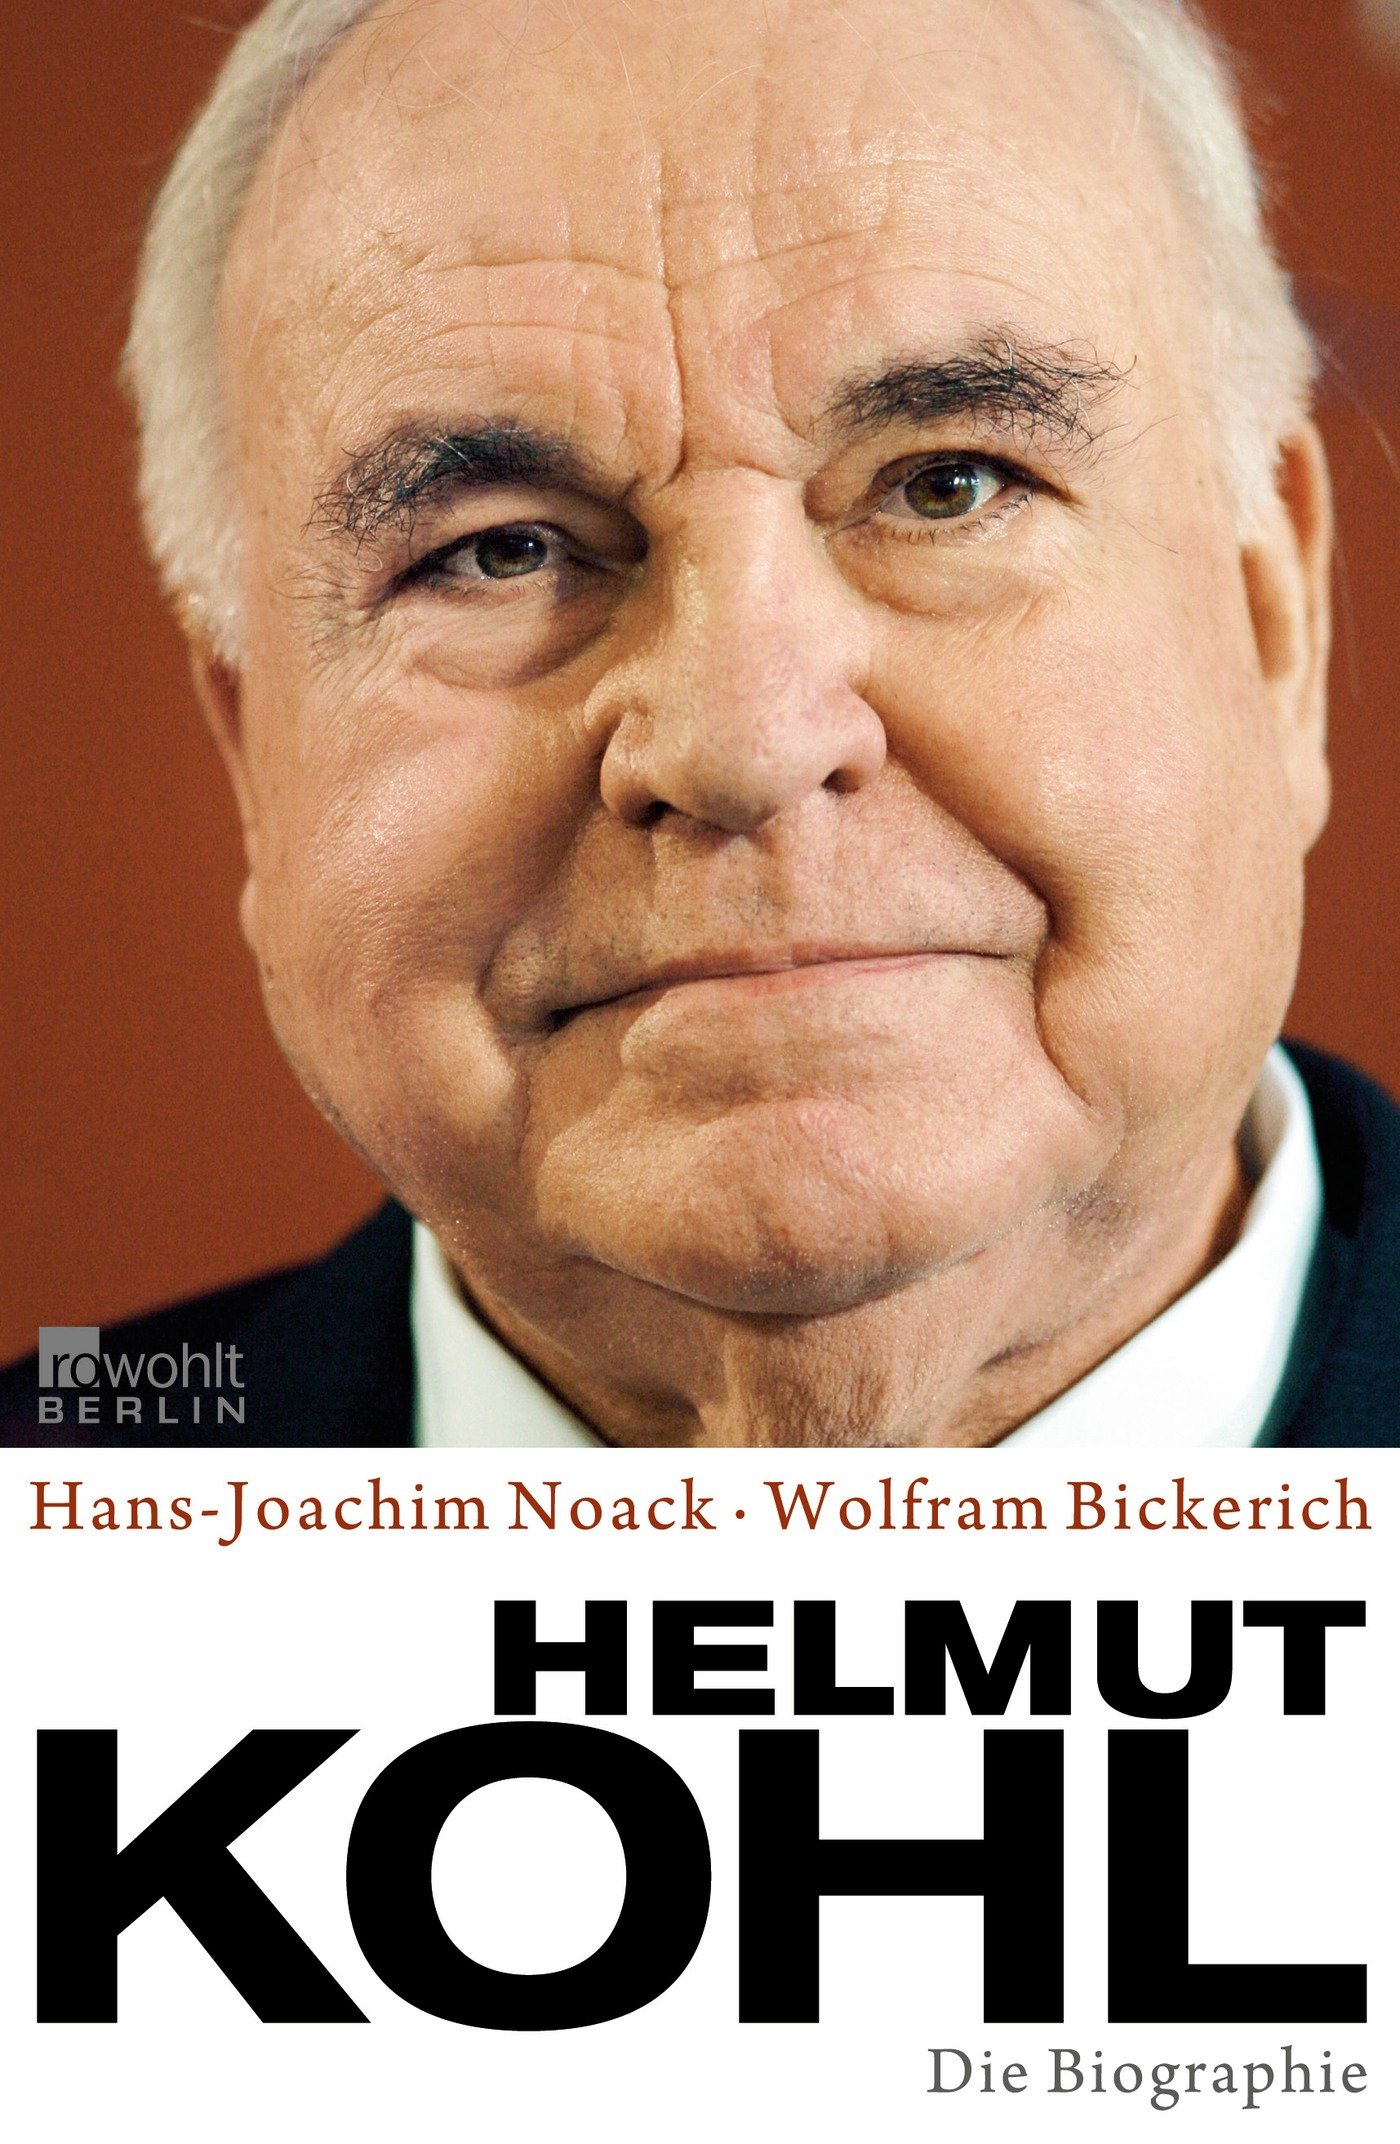 Helmut Kohl Die Biographie Amazon Hans Joachim Noack Wolfram